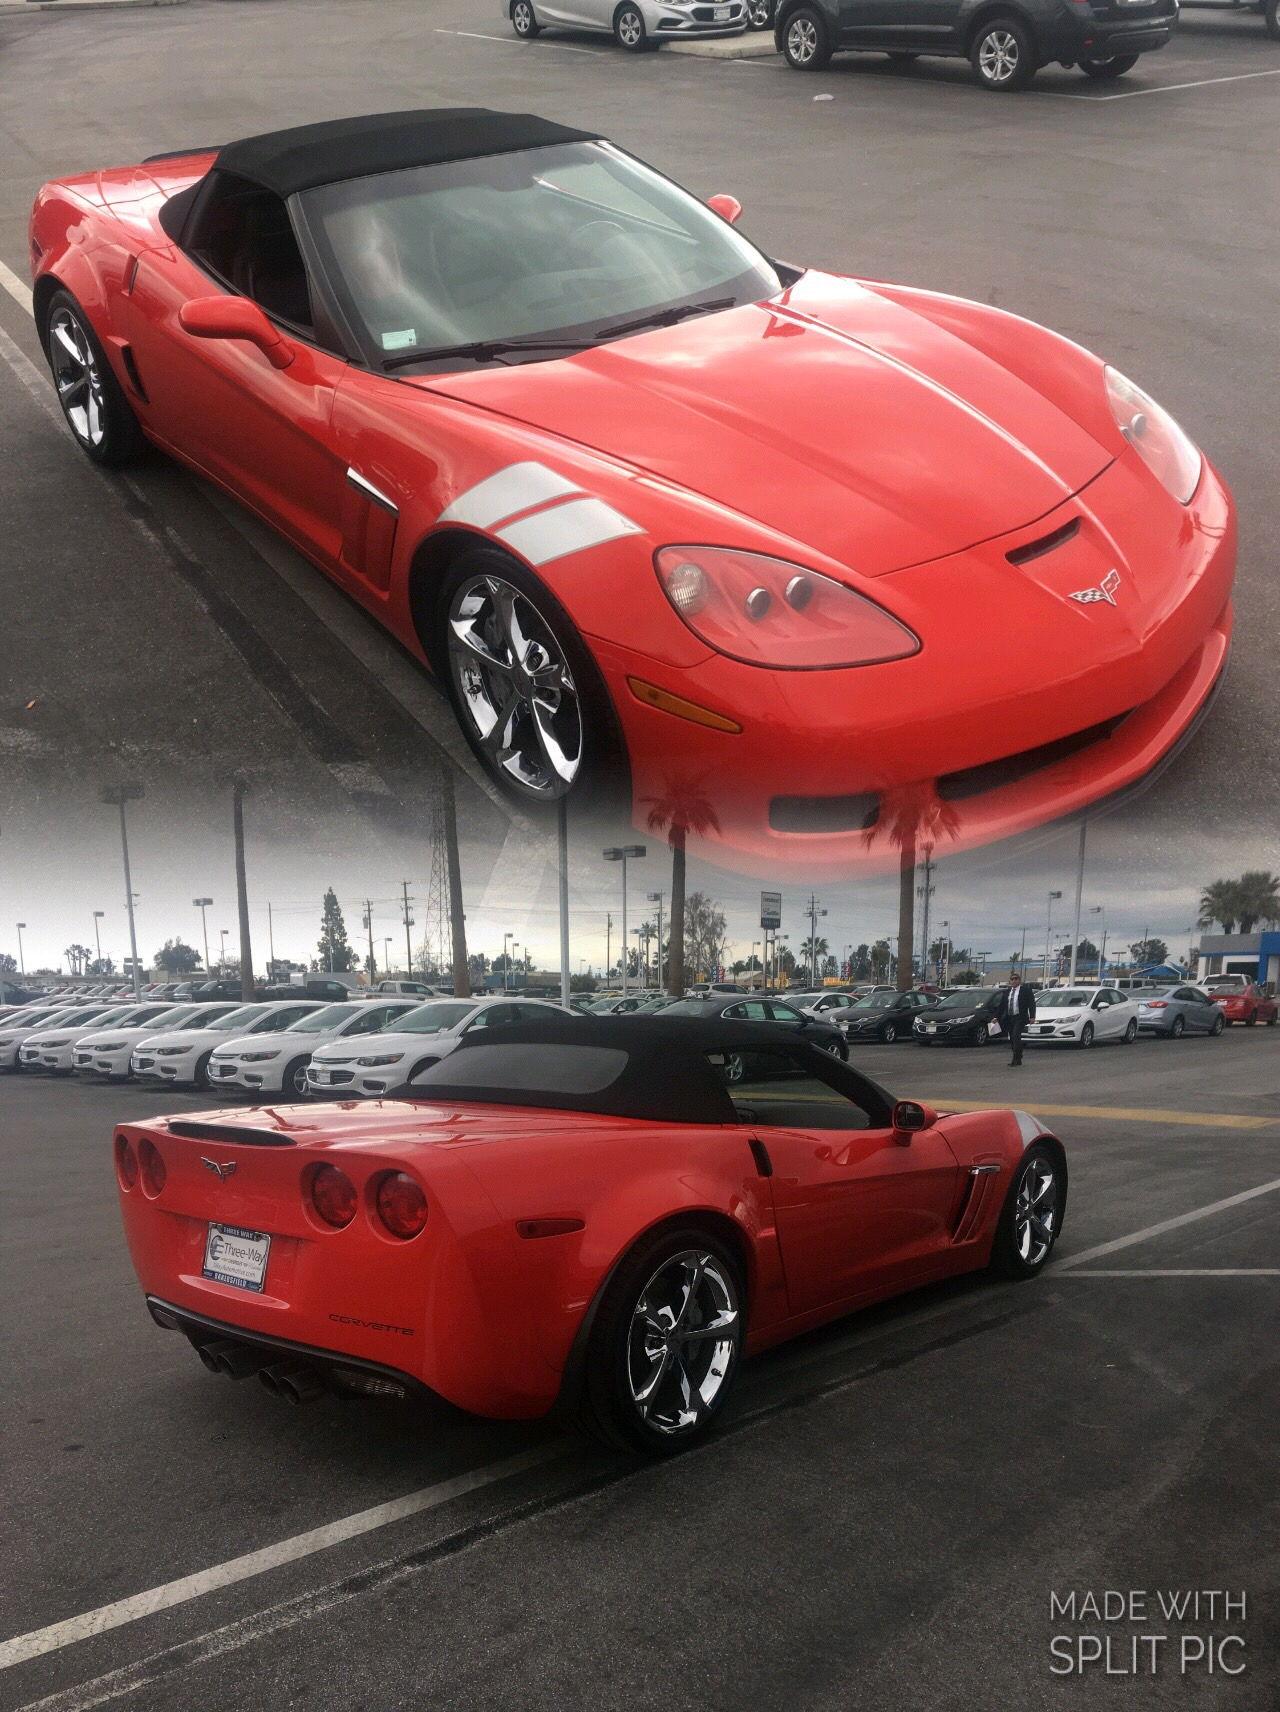 2005 Corvette For Sale >> FS: C6 Corvette SLP Rear Spoiler - Victory Red - CorvetteForum - Chevrolet Corvette Forum Discussion